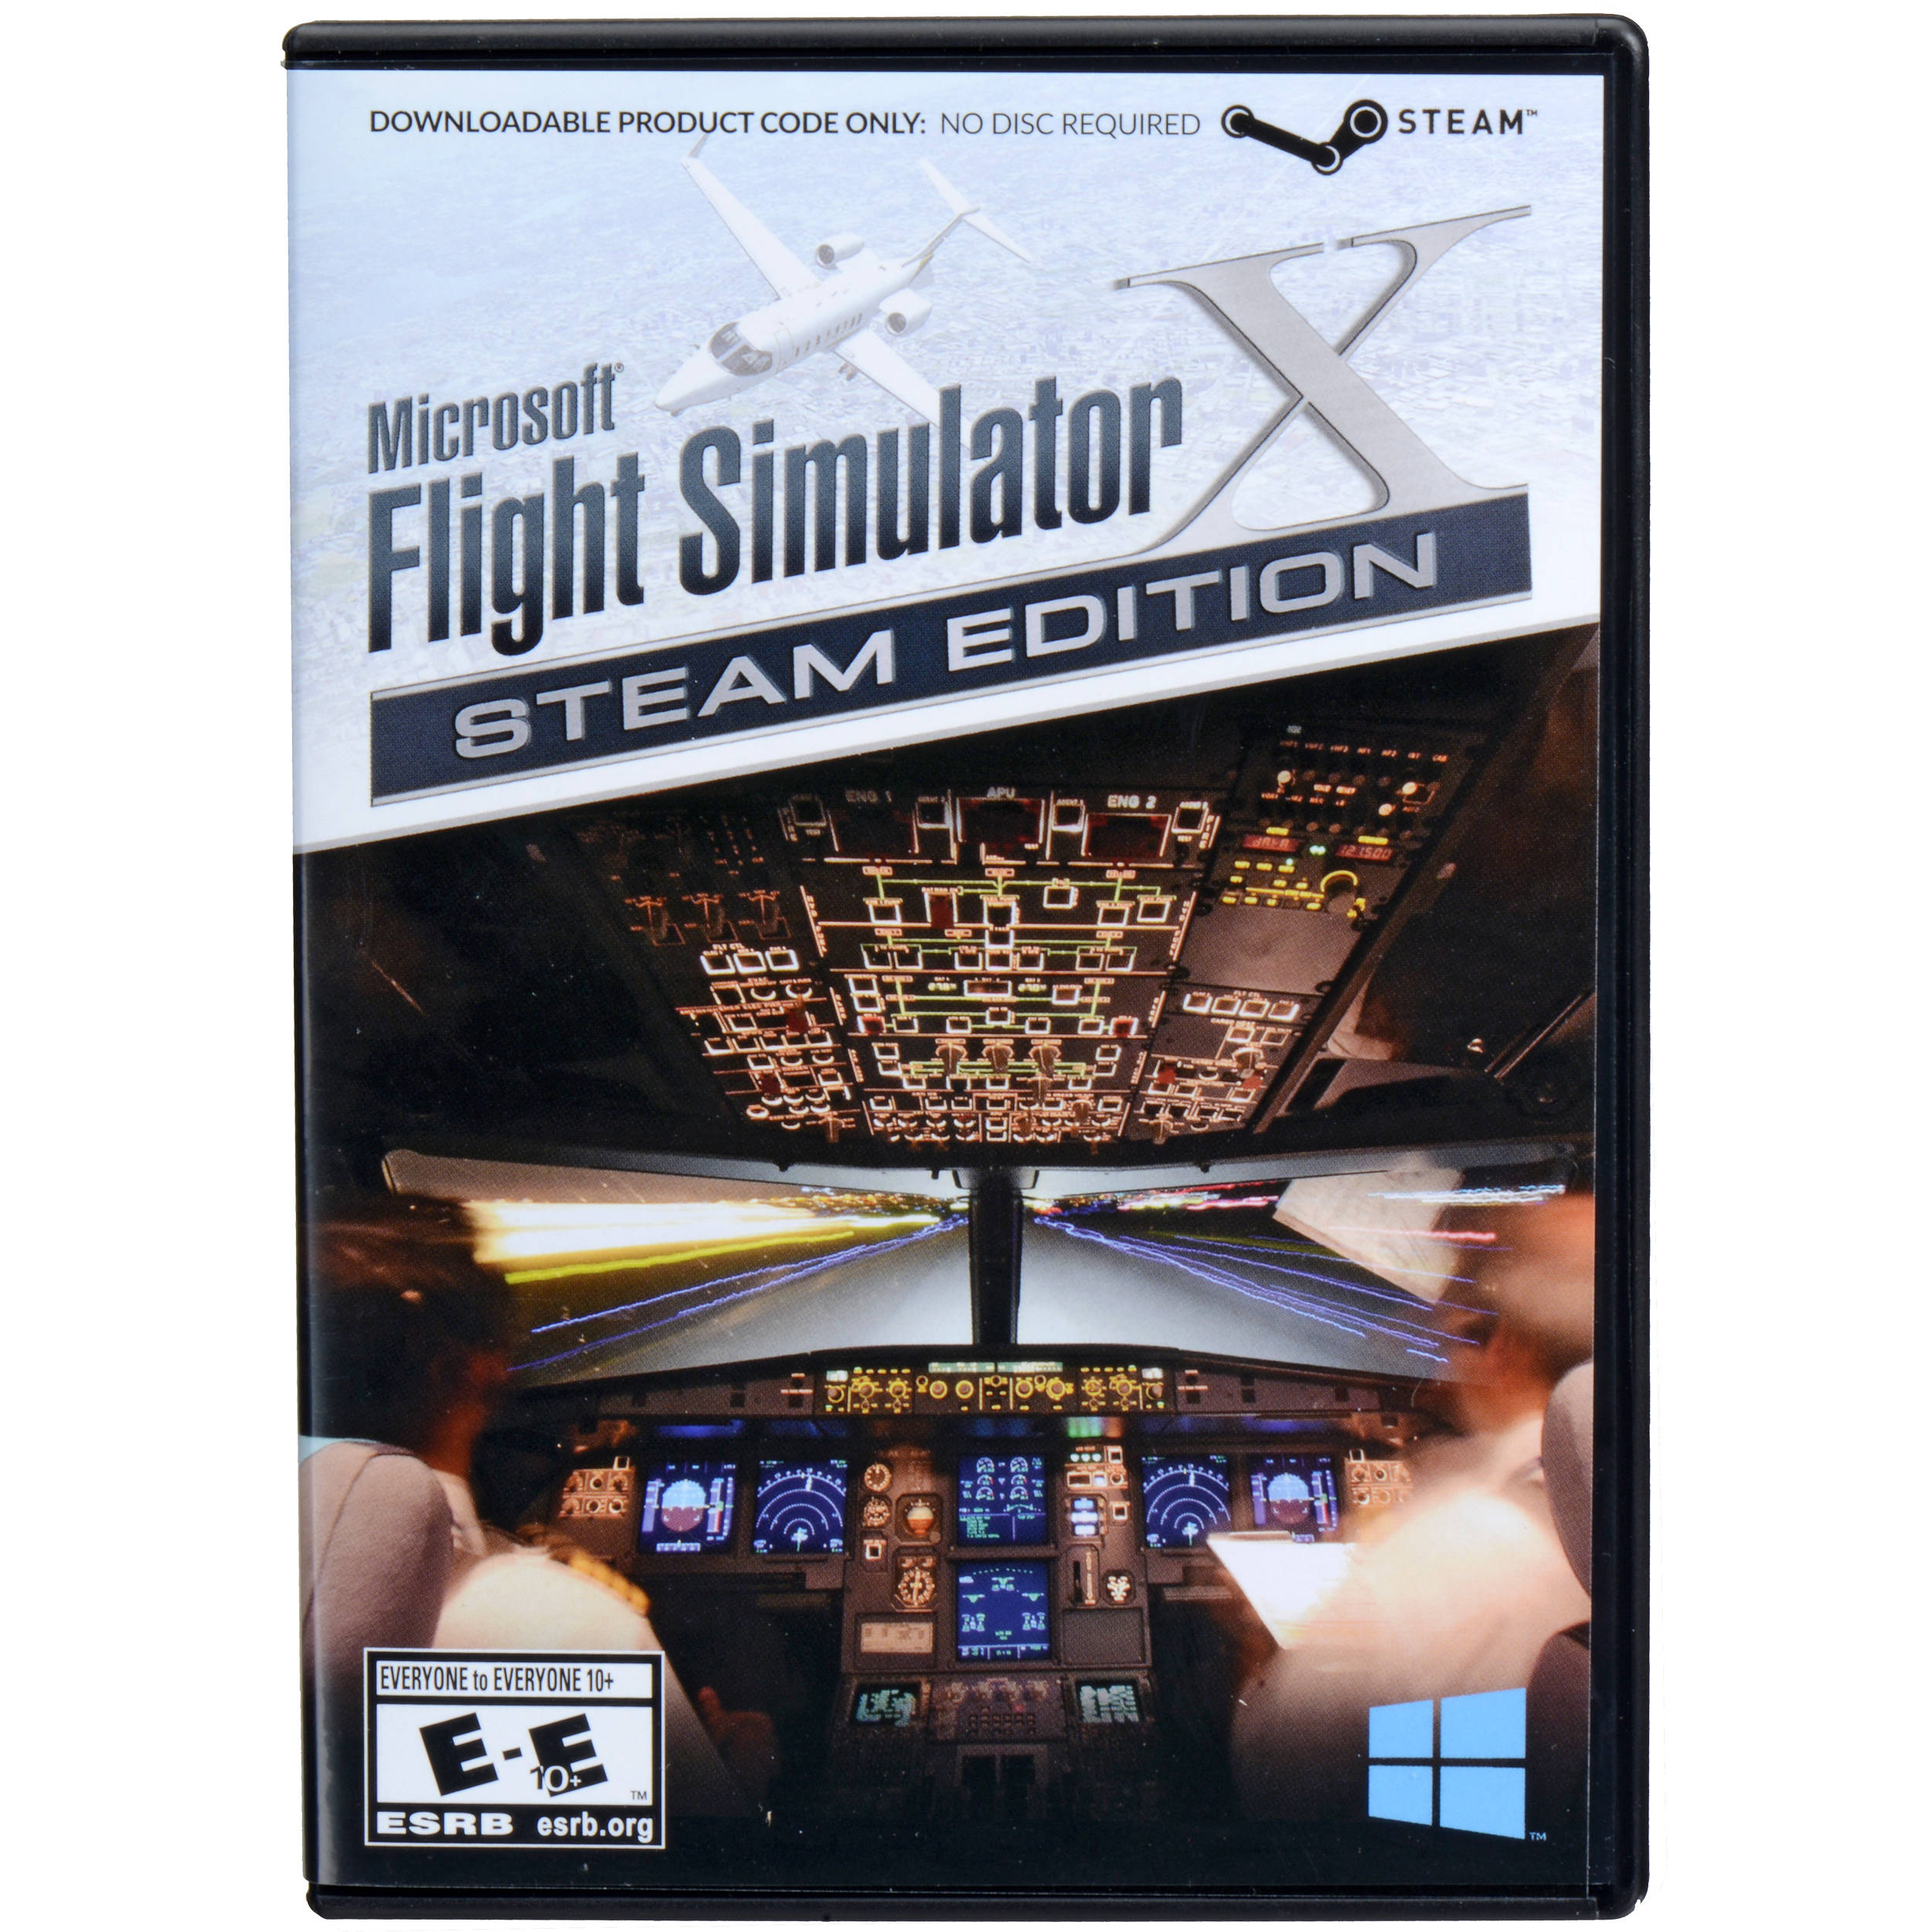 Microsoft Flight Simulator X: Steam Edition (PC, Download Code)